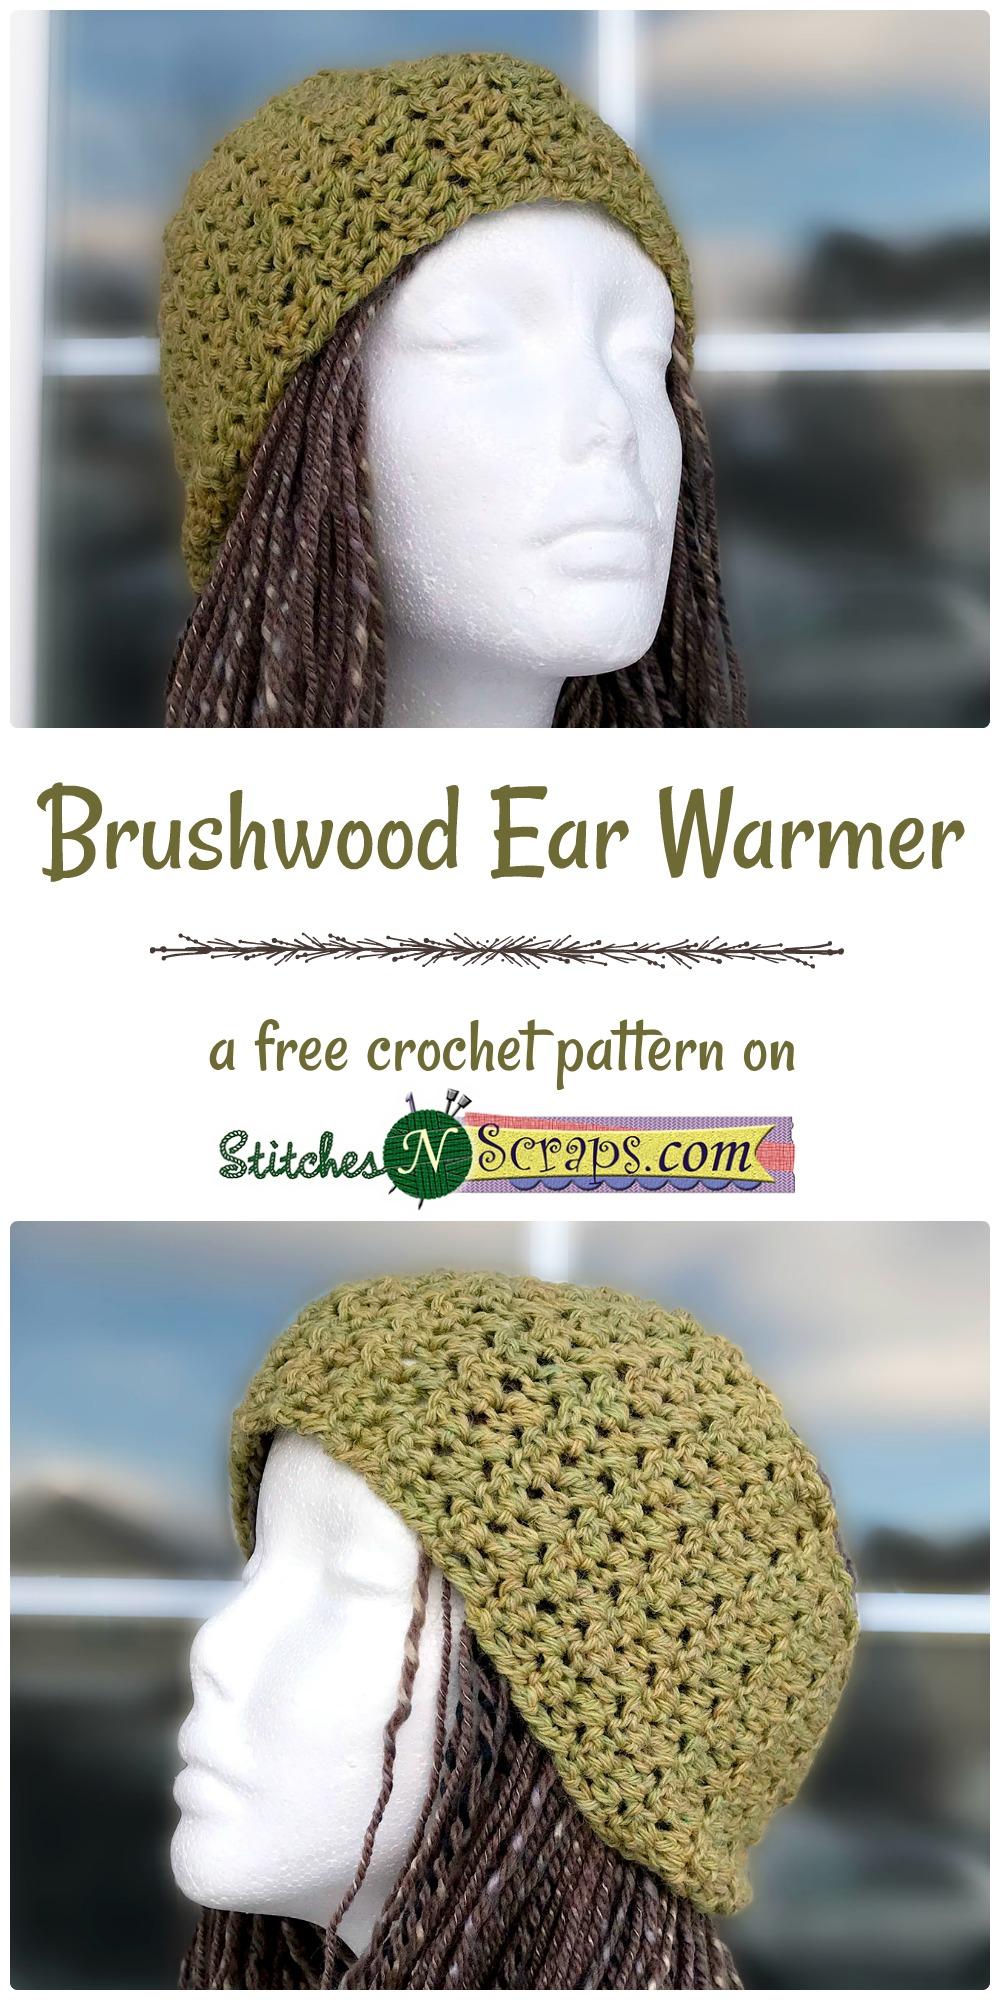 Free Pattern Brushwood Ear Warmer Stitches N Scraps